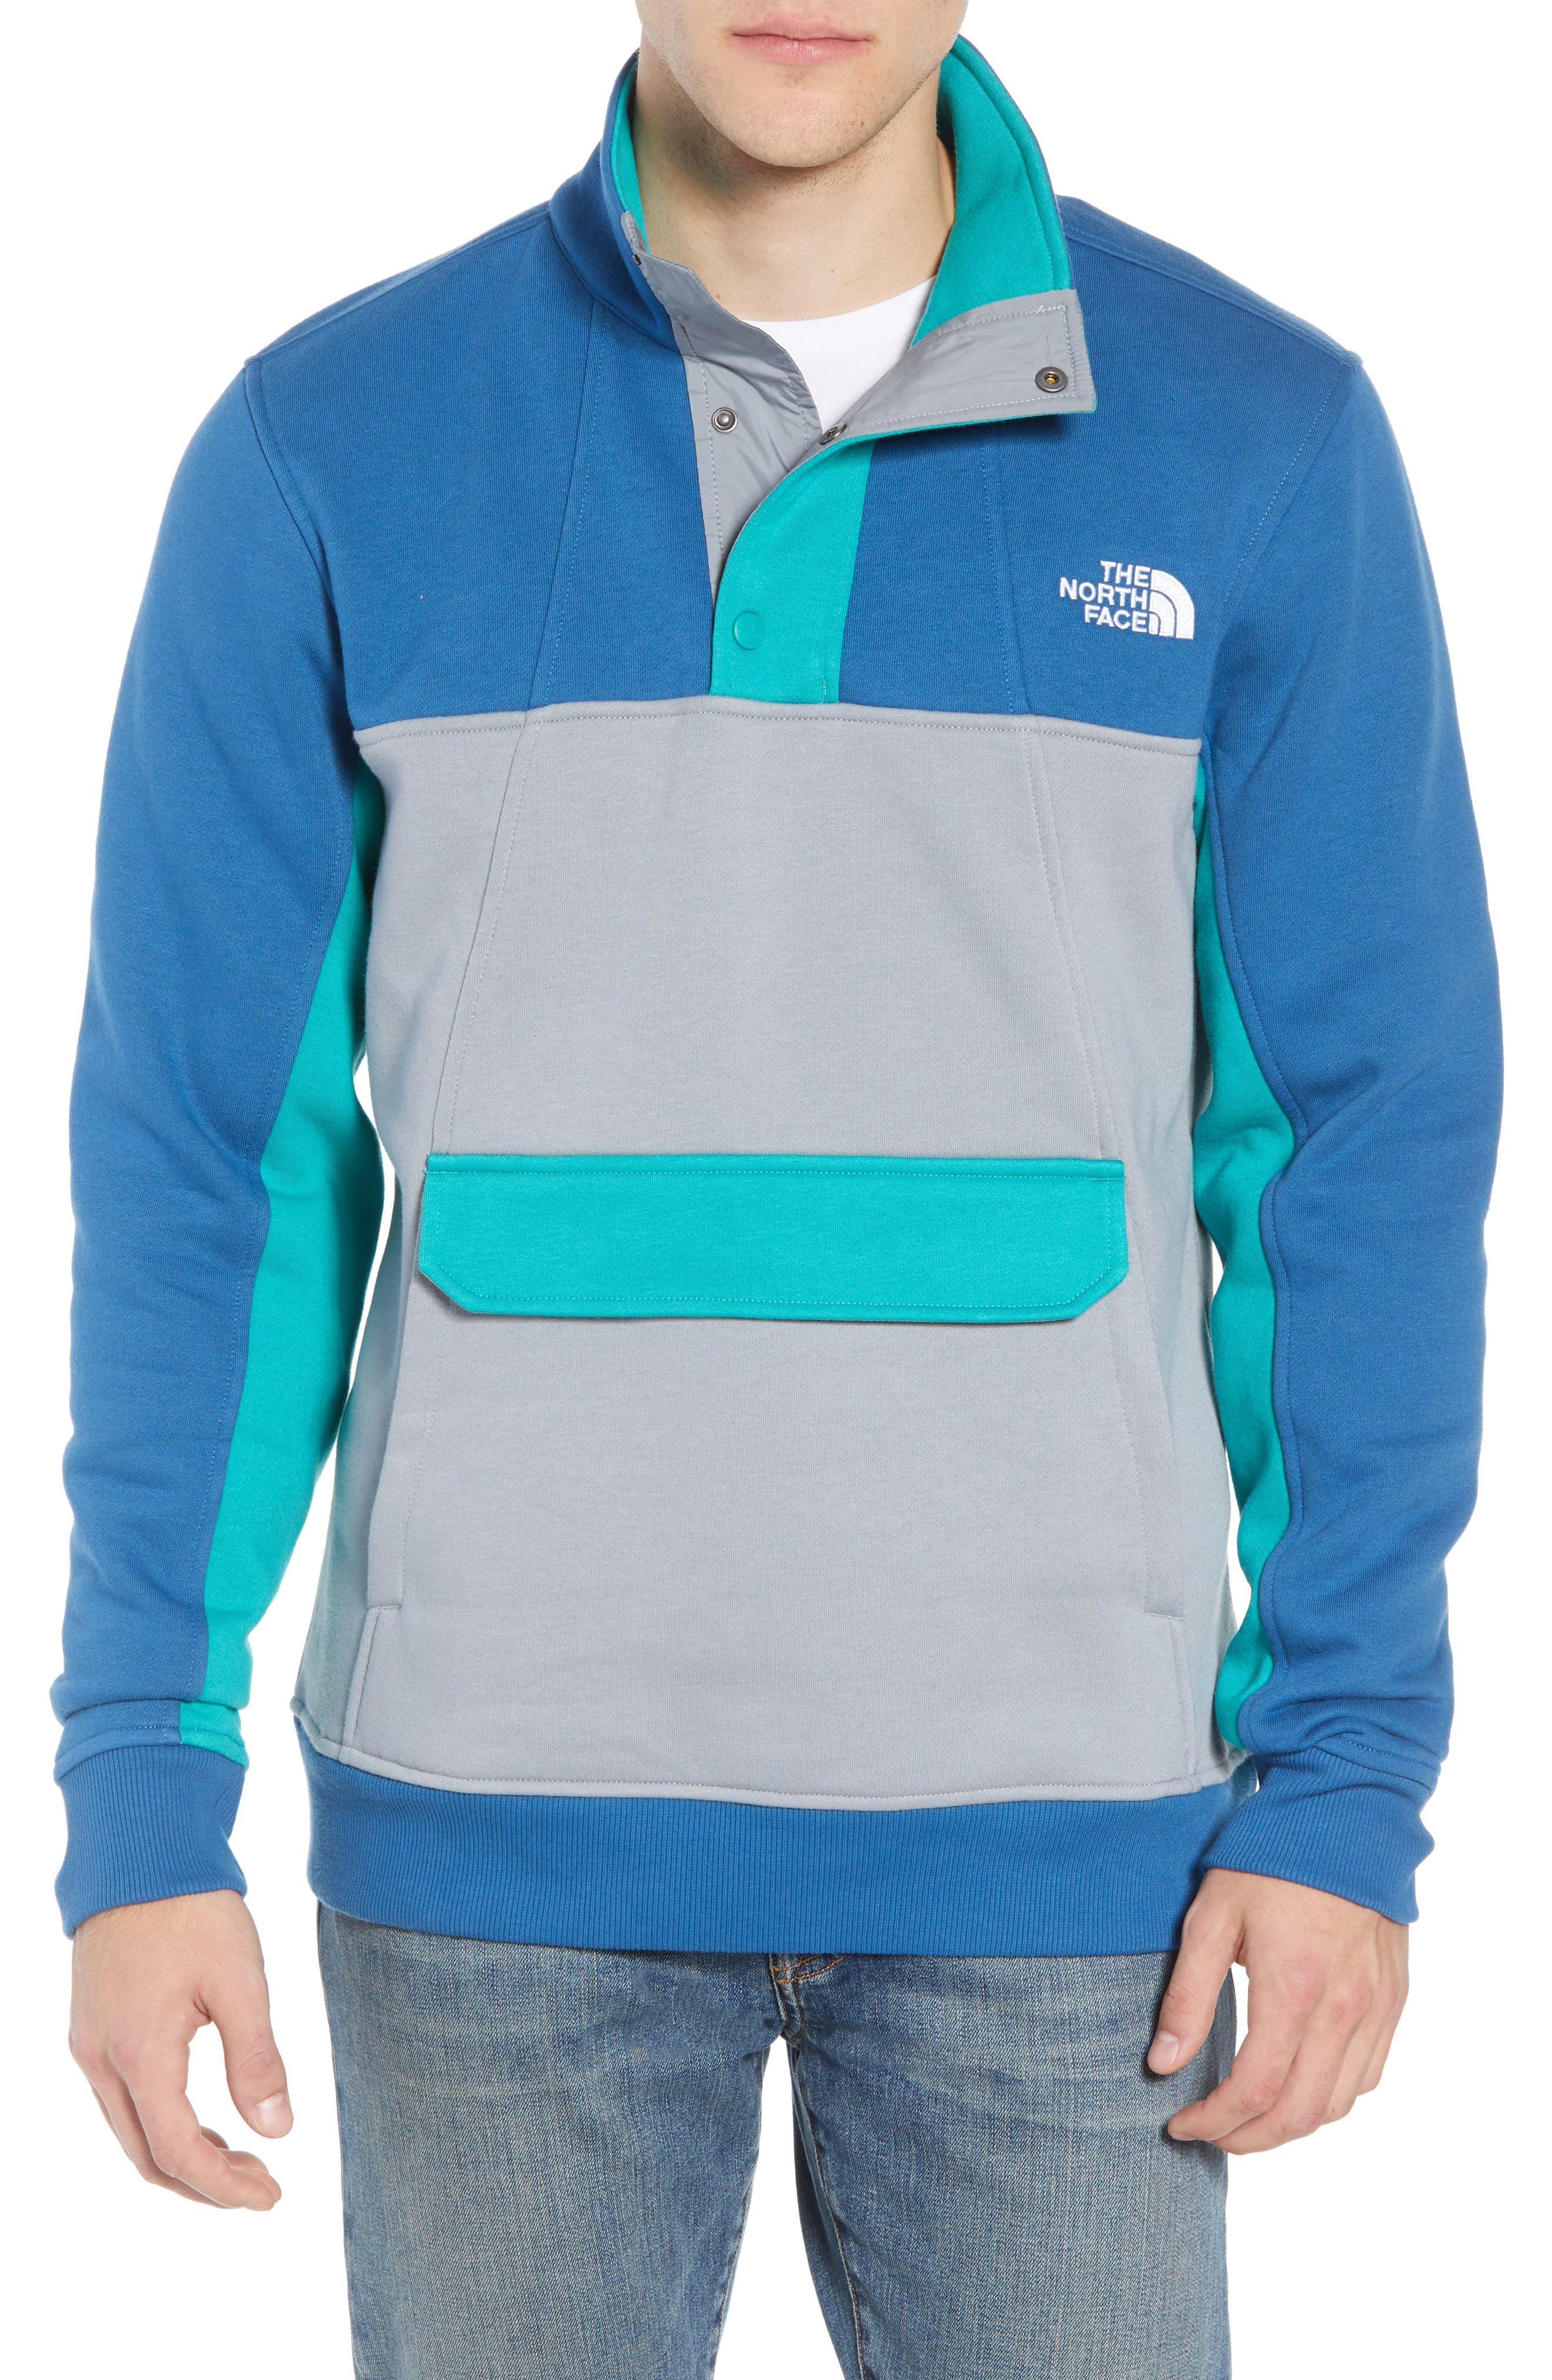 Alphabet City Fleece Pullover,                             Main thumbnail 1, color,                             DISH BLUE/ MID GREY/ GREEN